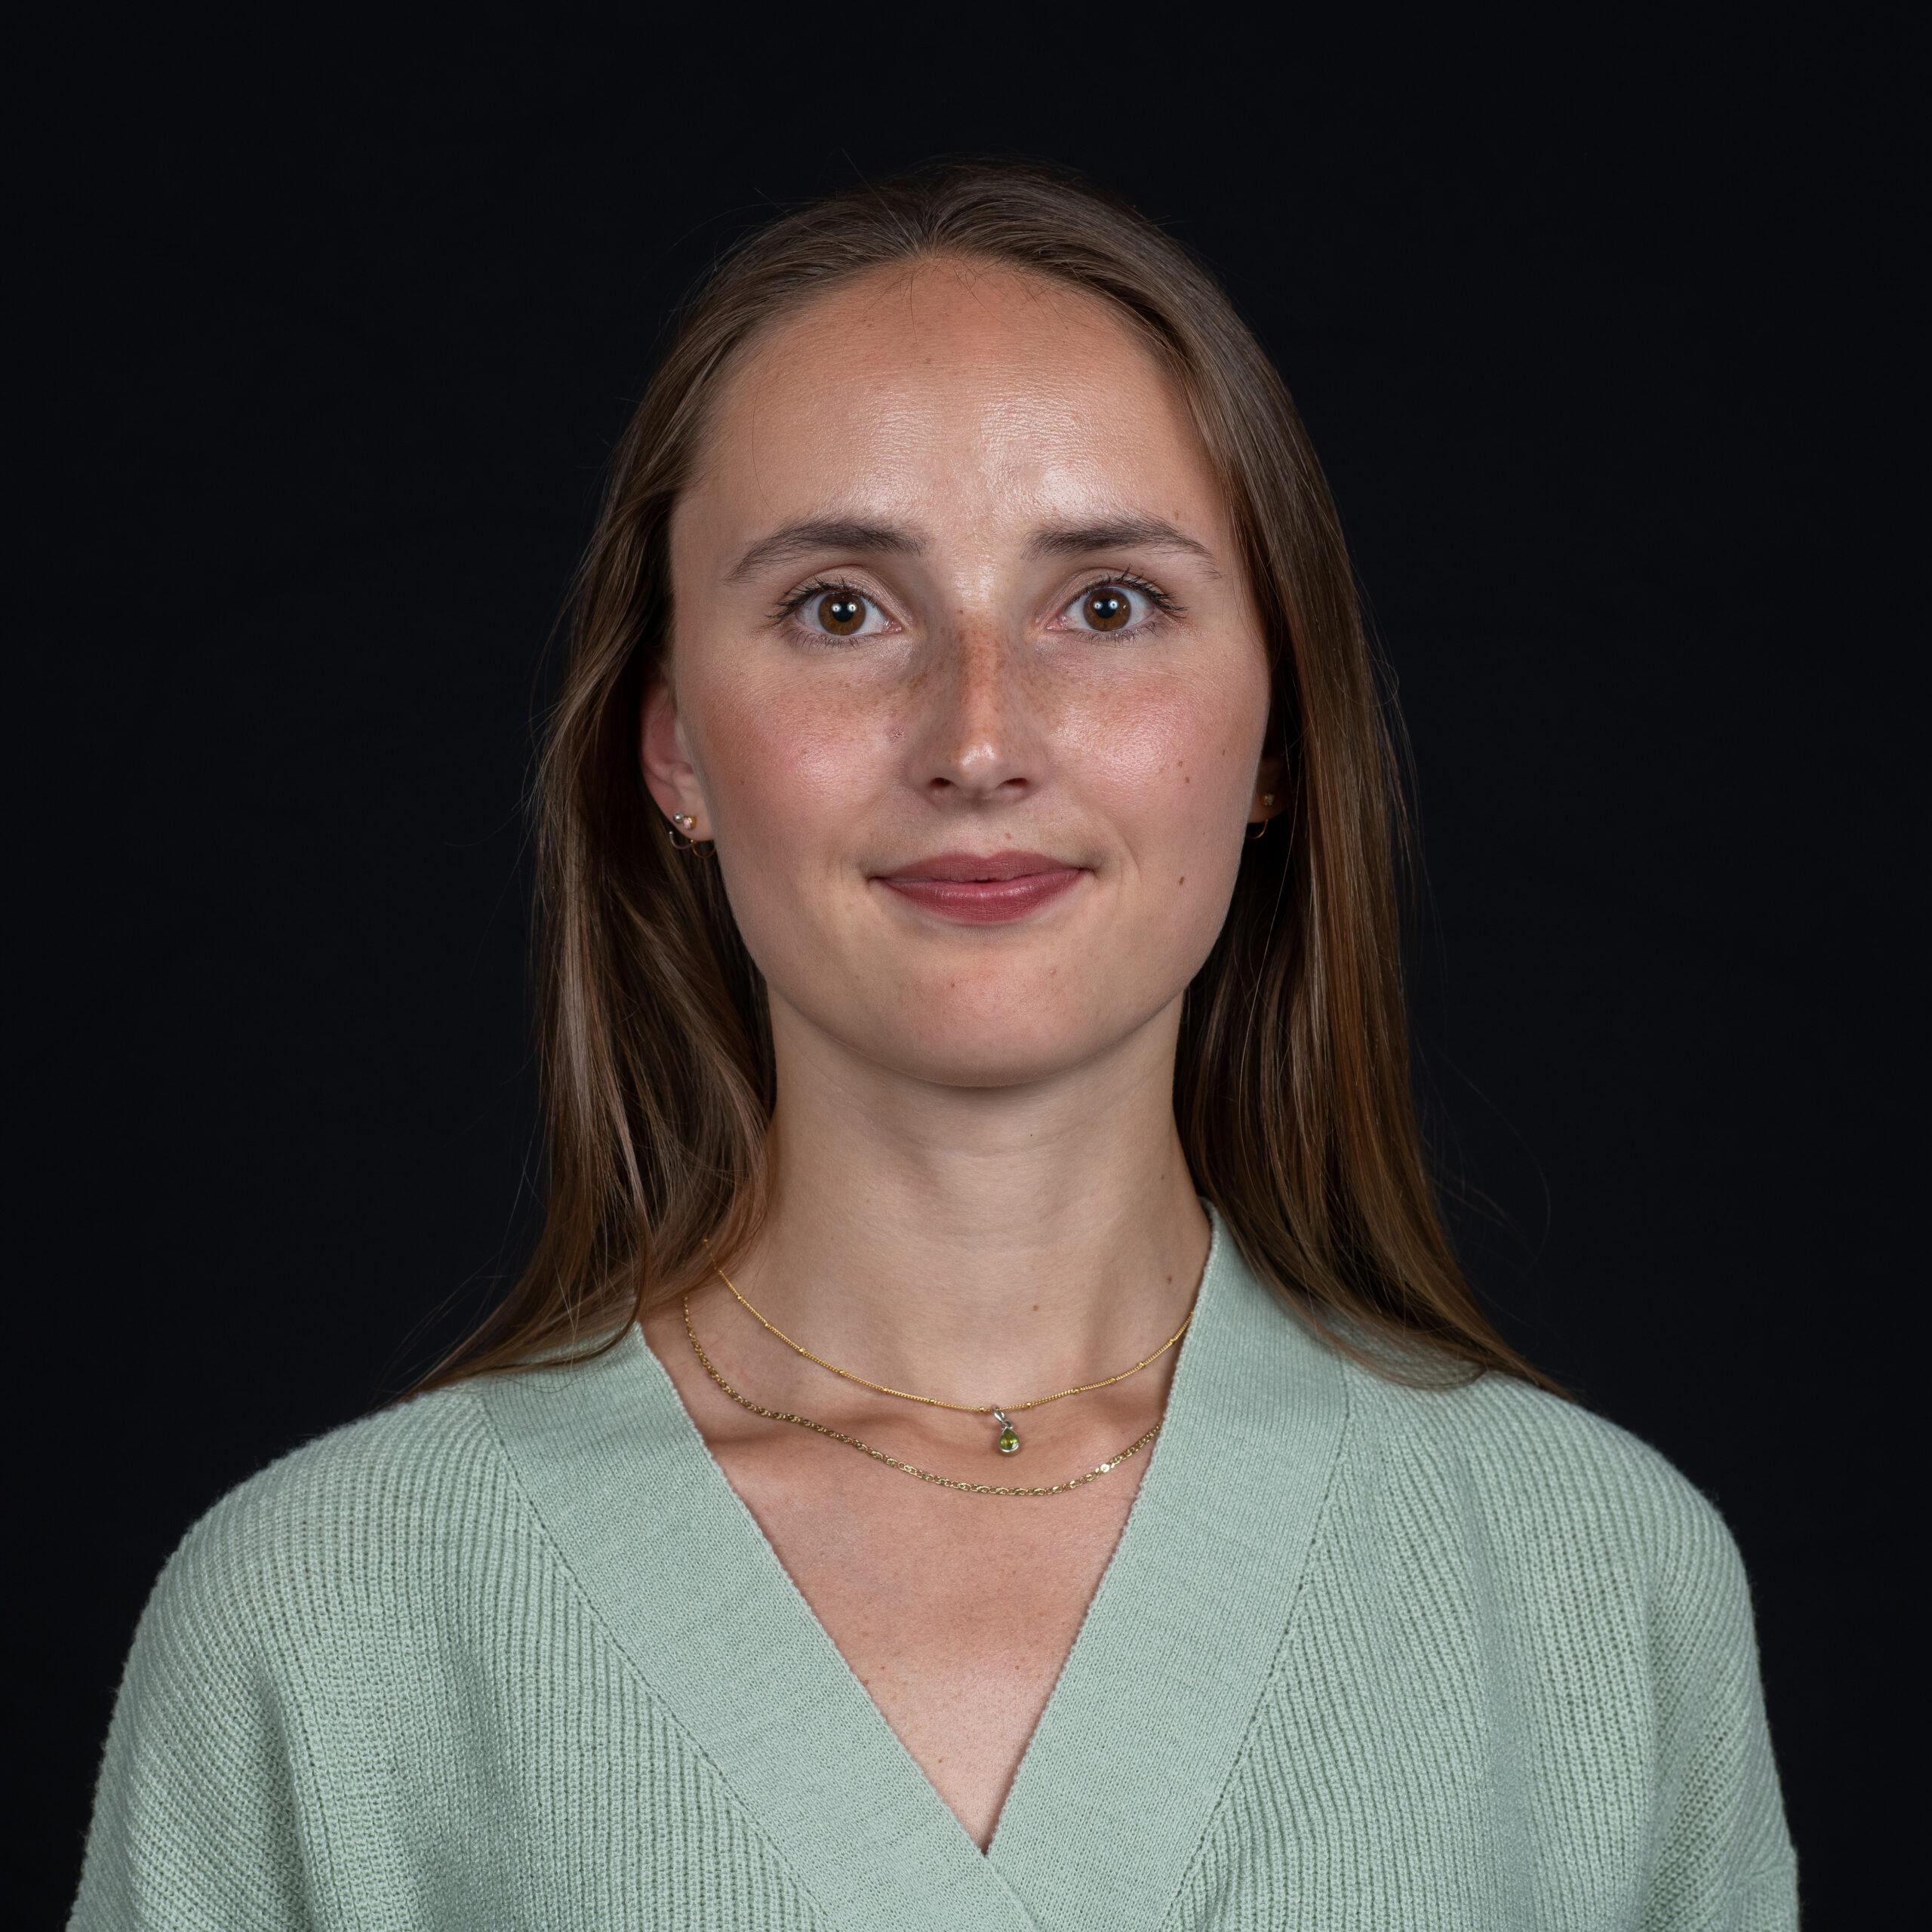 Nana Kronberg Jensen